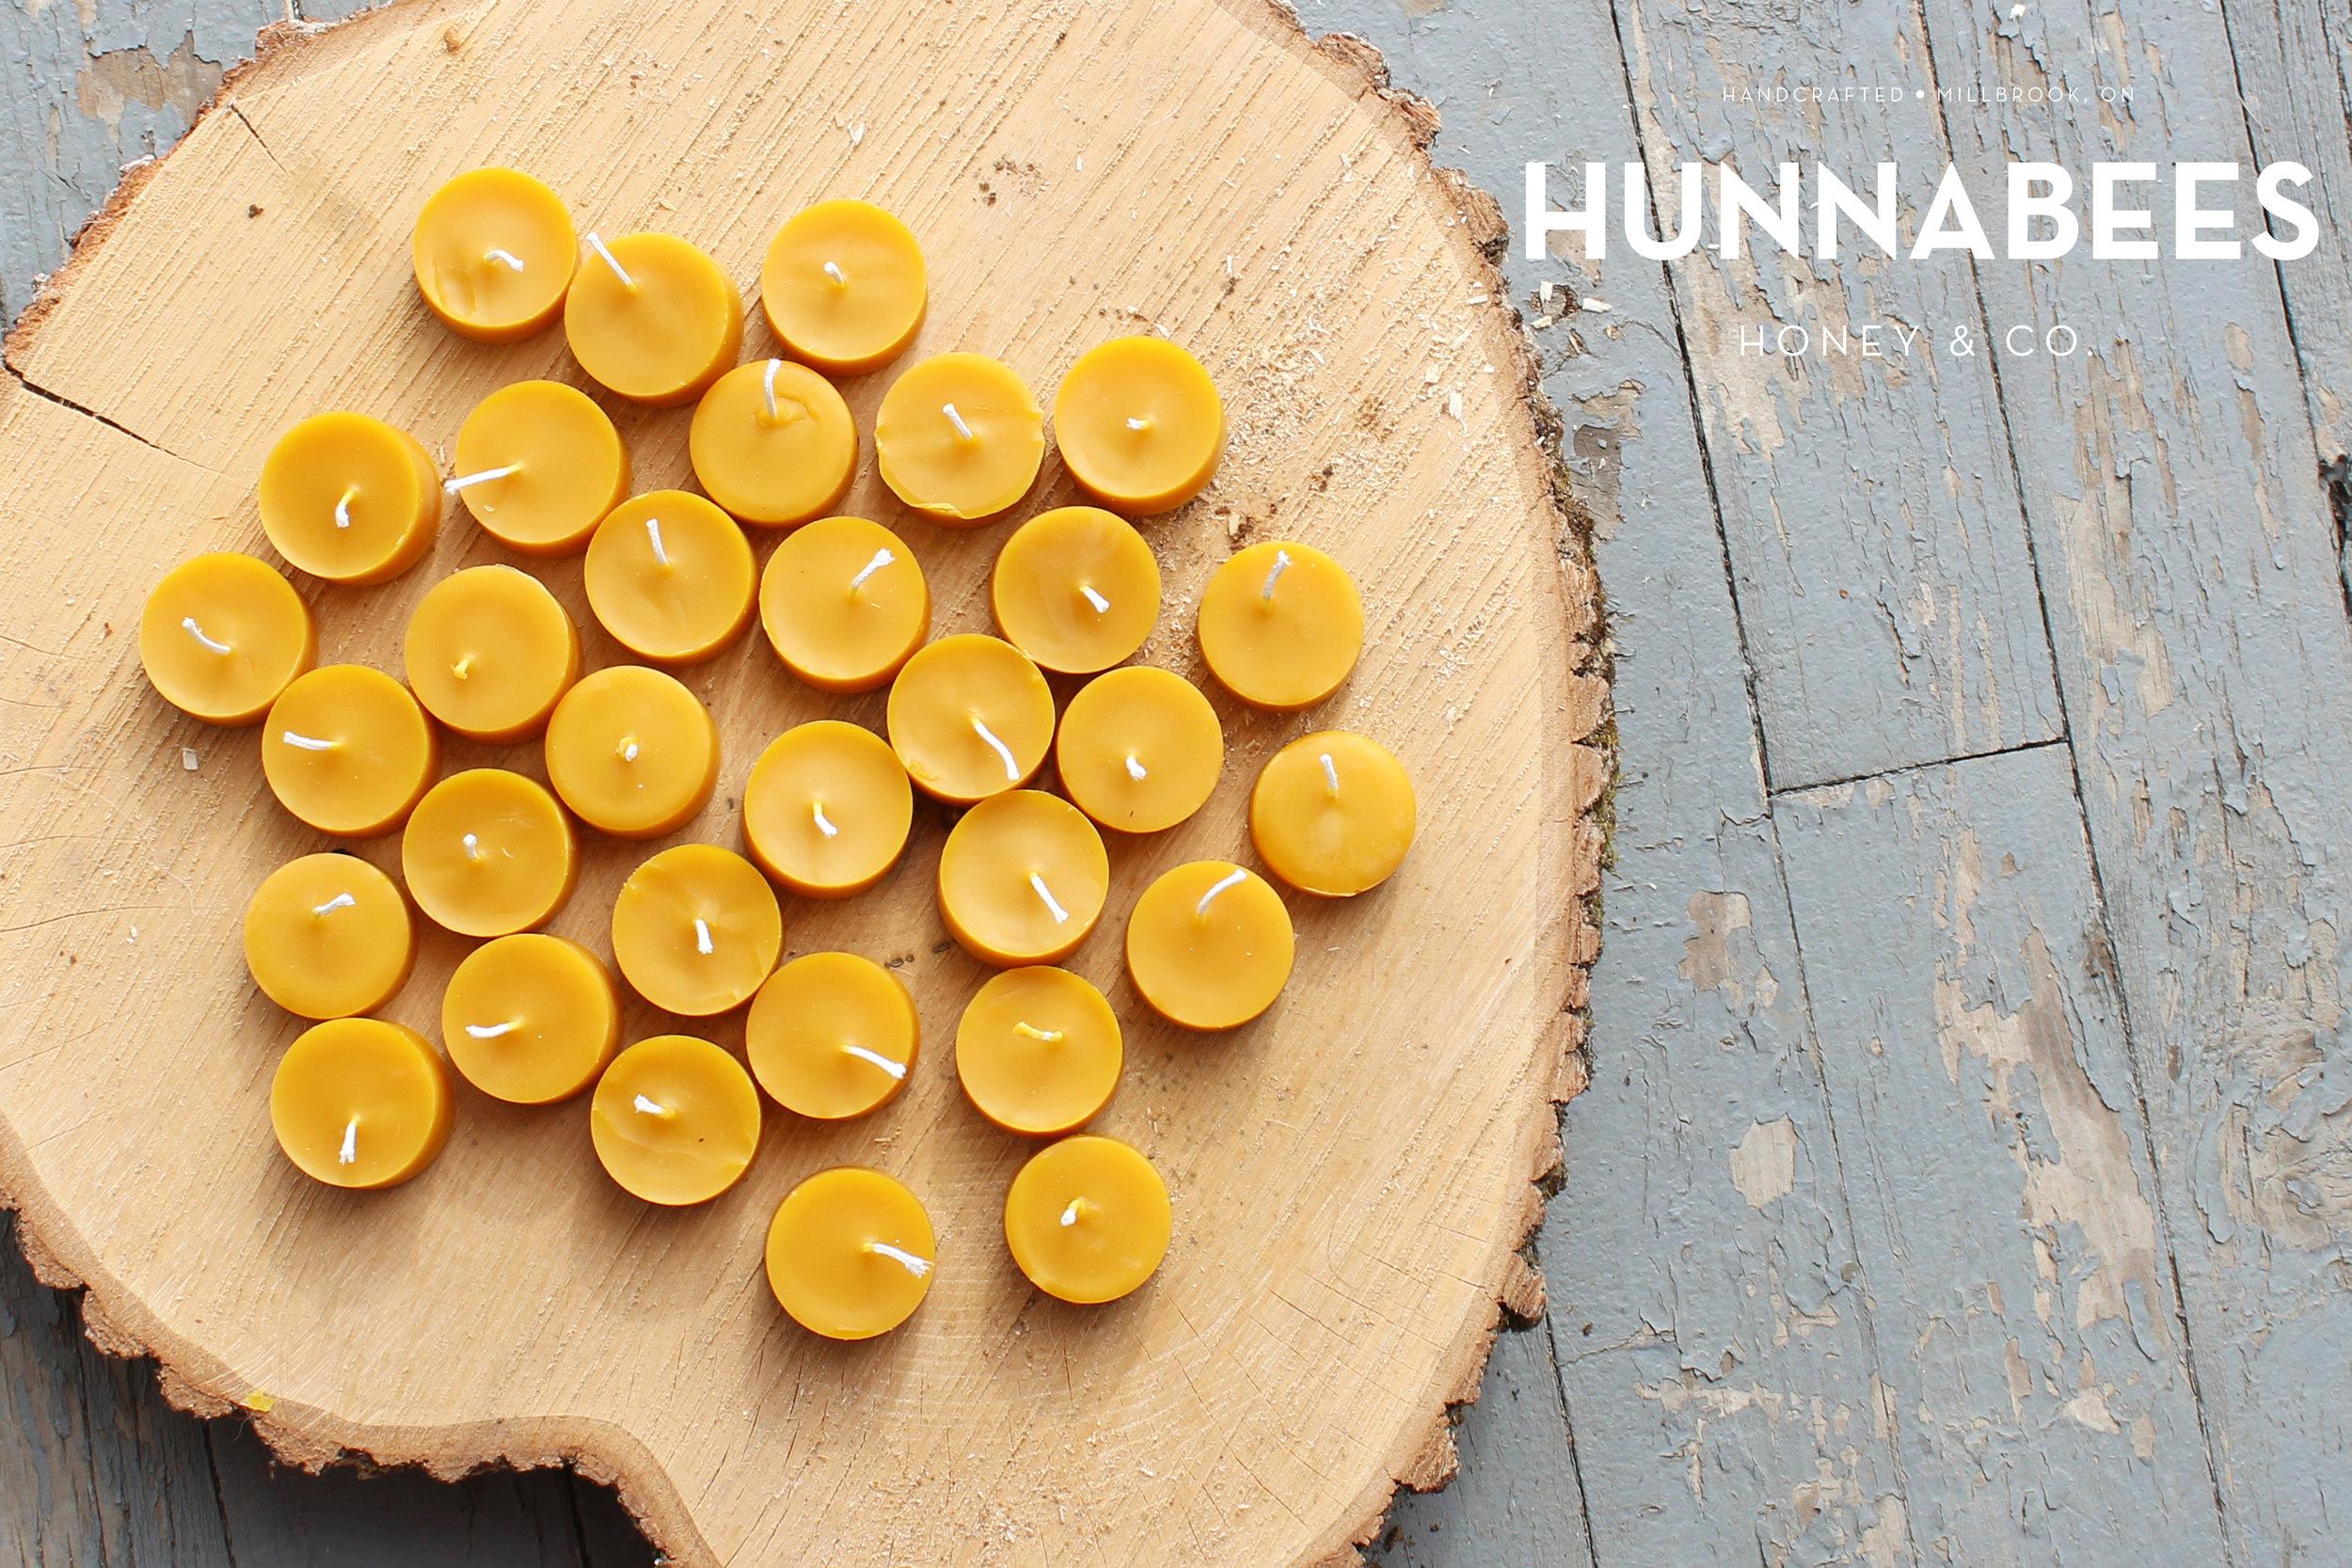 Hunnabees_13.jpg